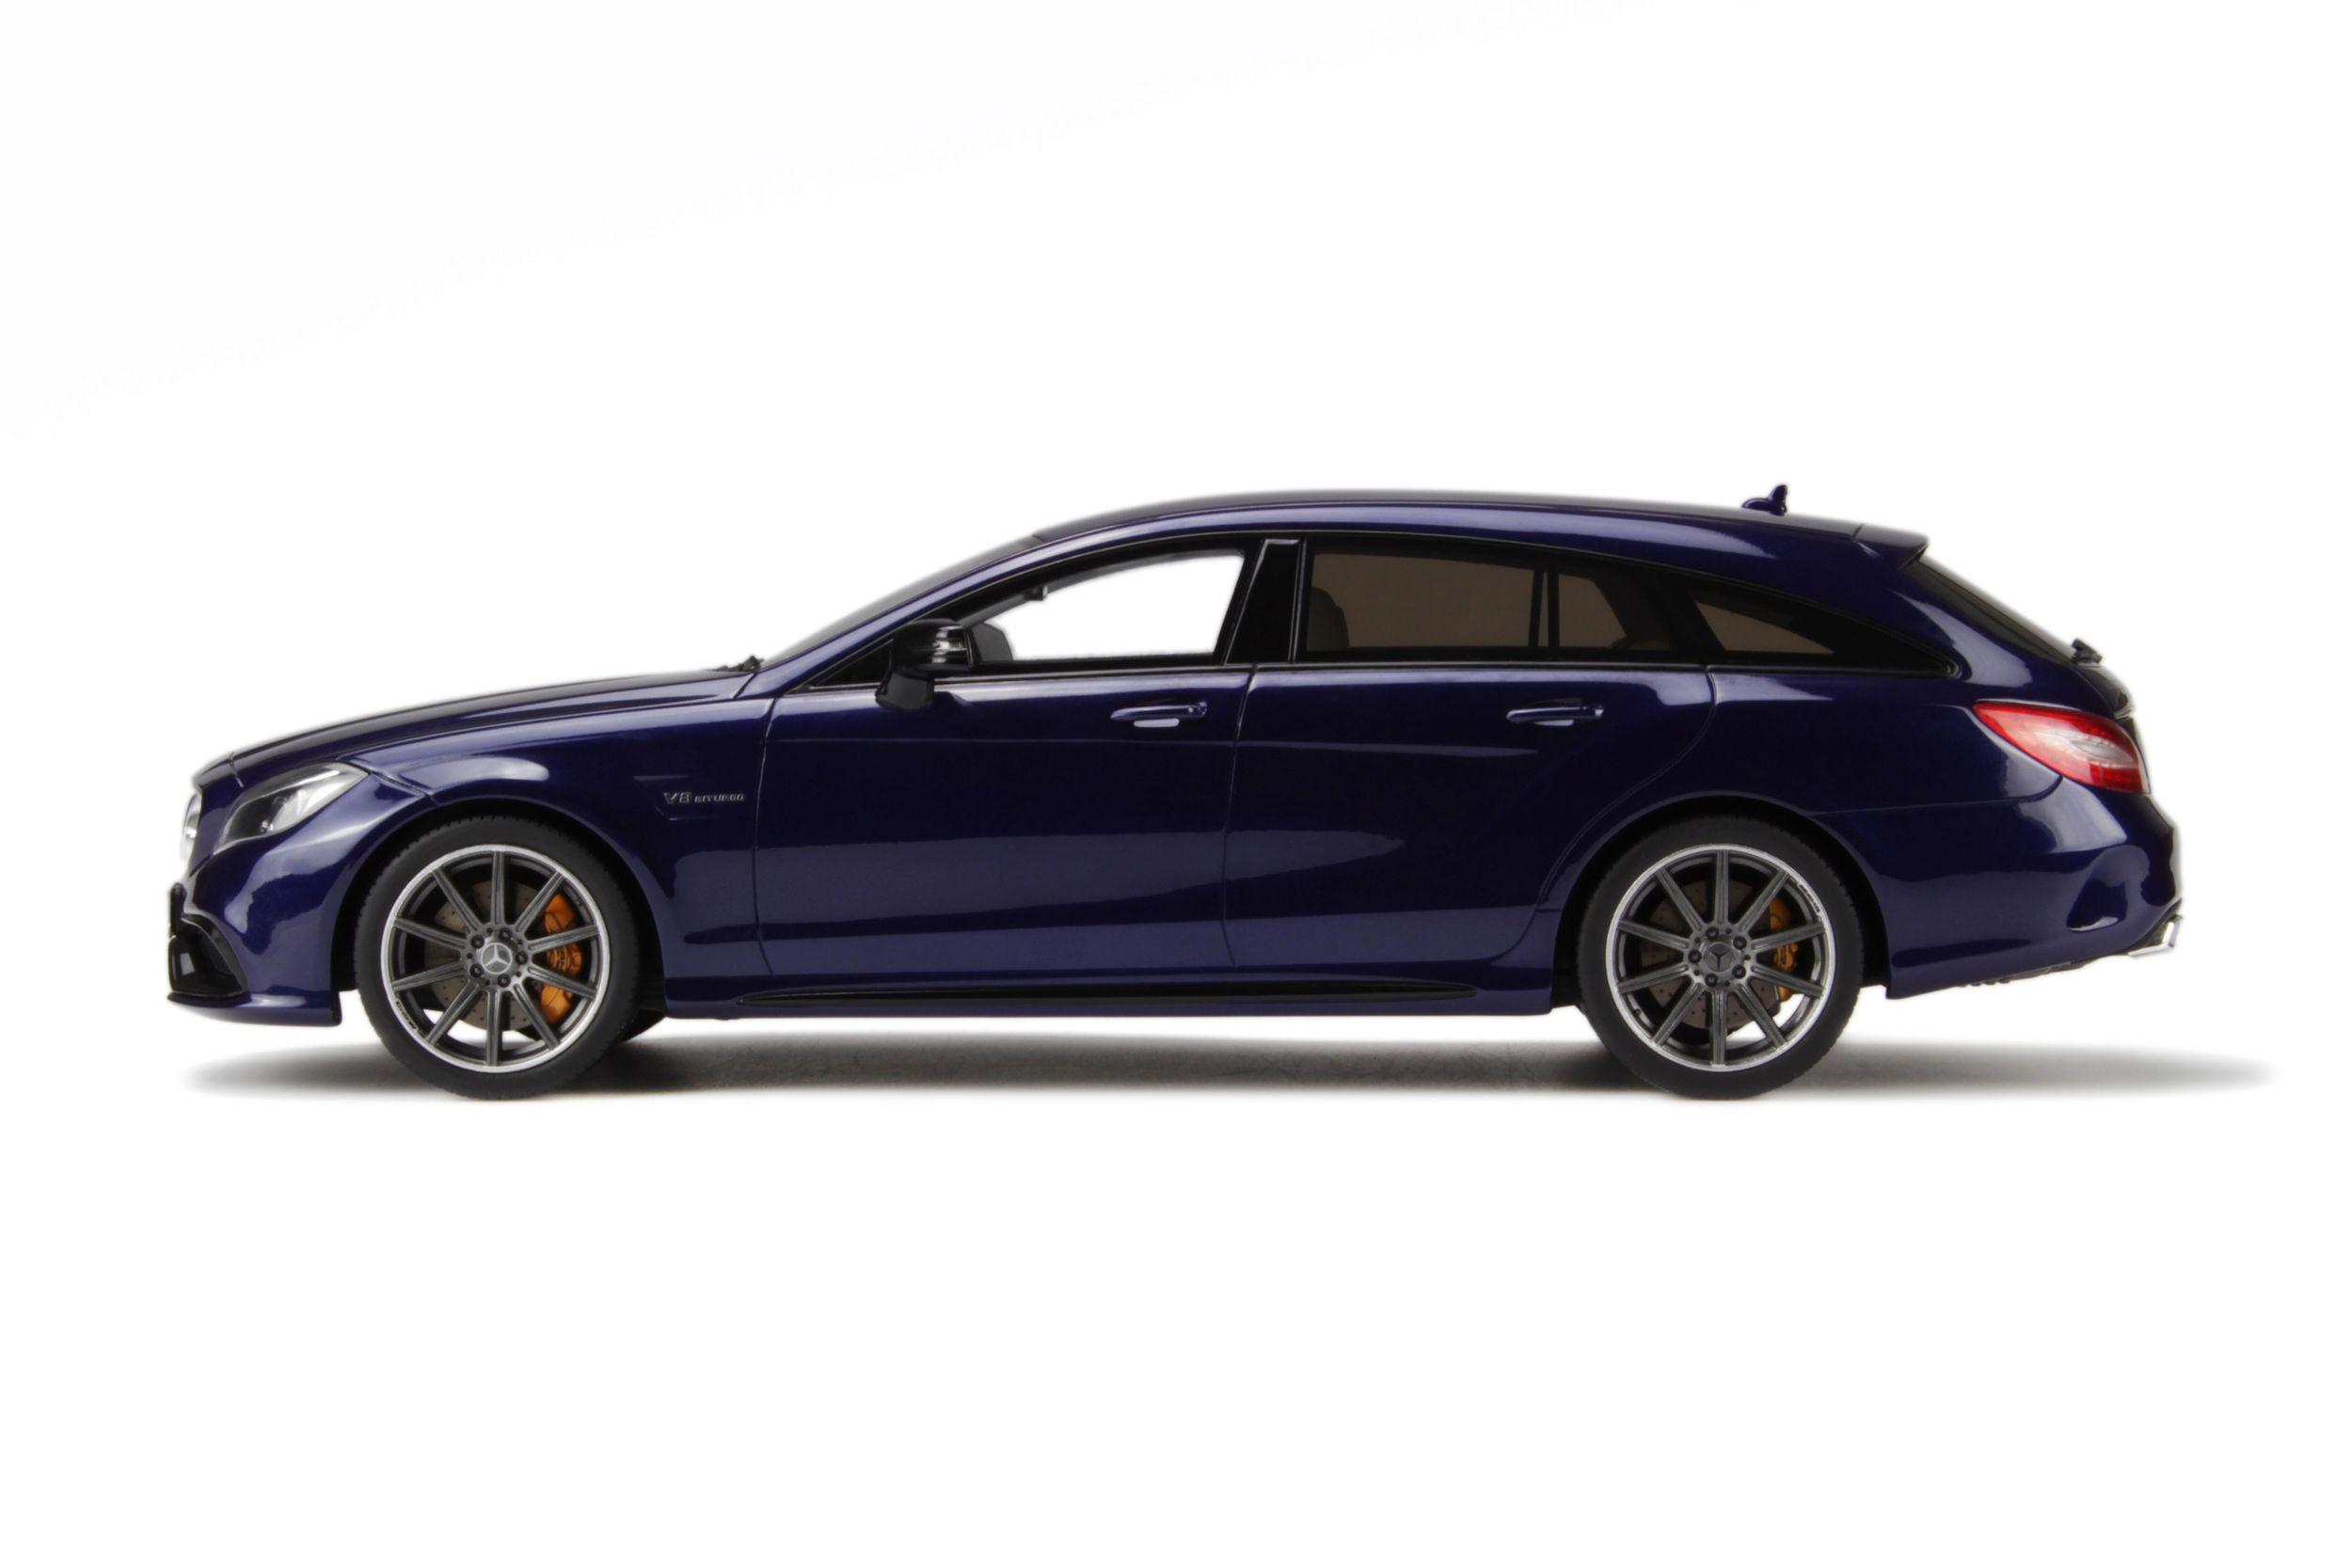 C63 Amg Black Series >> Mercedes-Benz CLS 63 AMG Shooting Brake - Model car ...